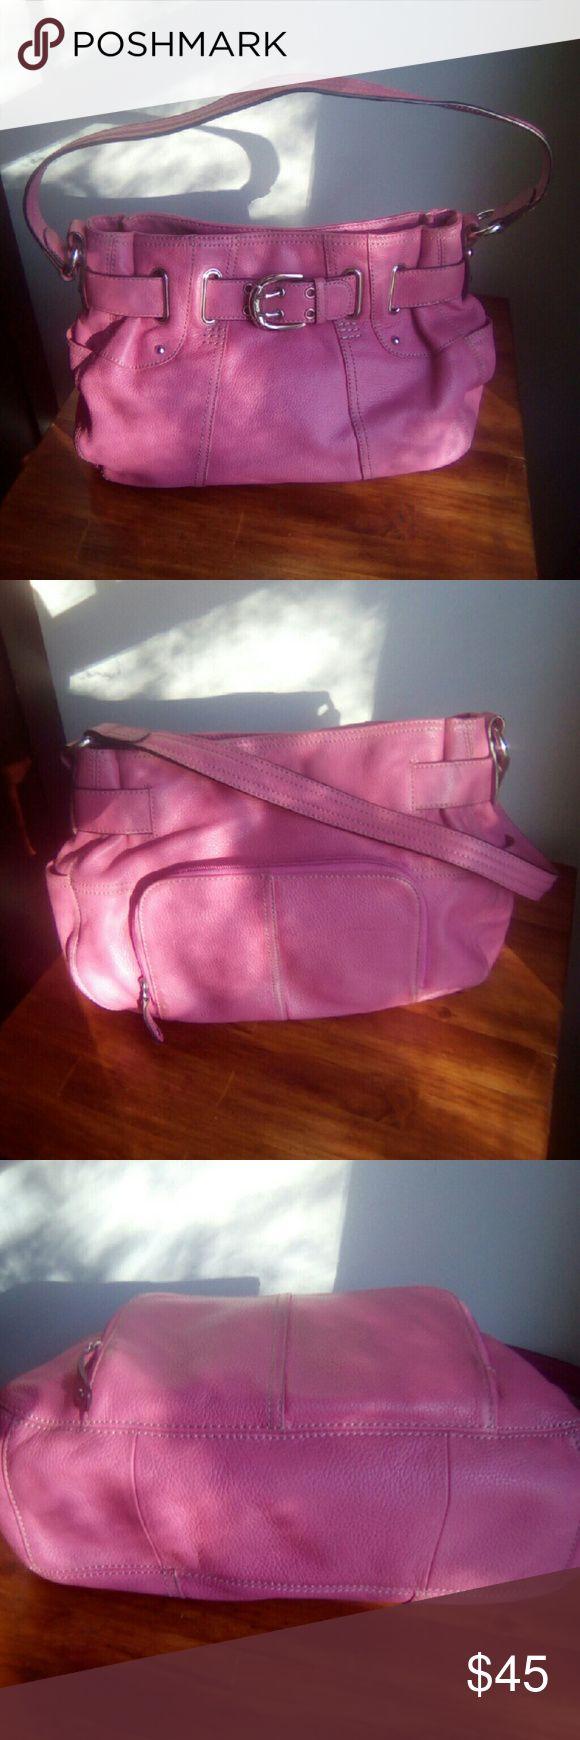 Tignanello Handbag Great used Handbag, in good condition. Pink is color. Zipper pocket on back, pic 2. Inside zipper pocket & small o e. Tignanello Bags Shoulder Bags